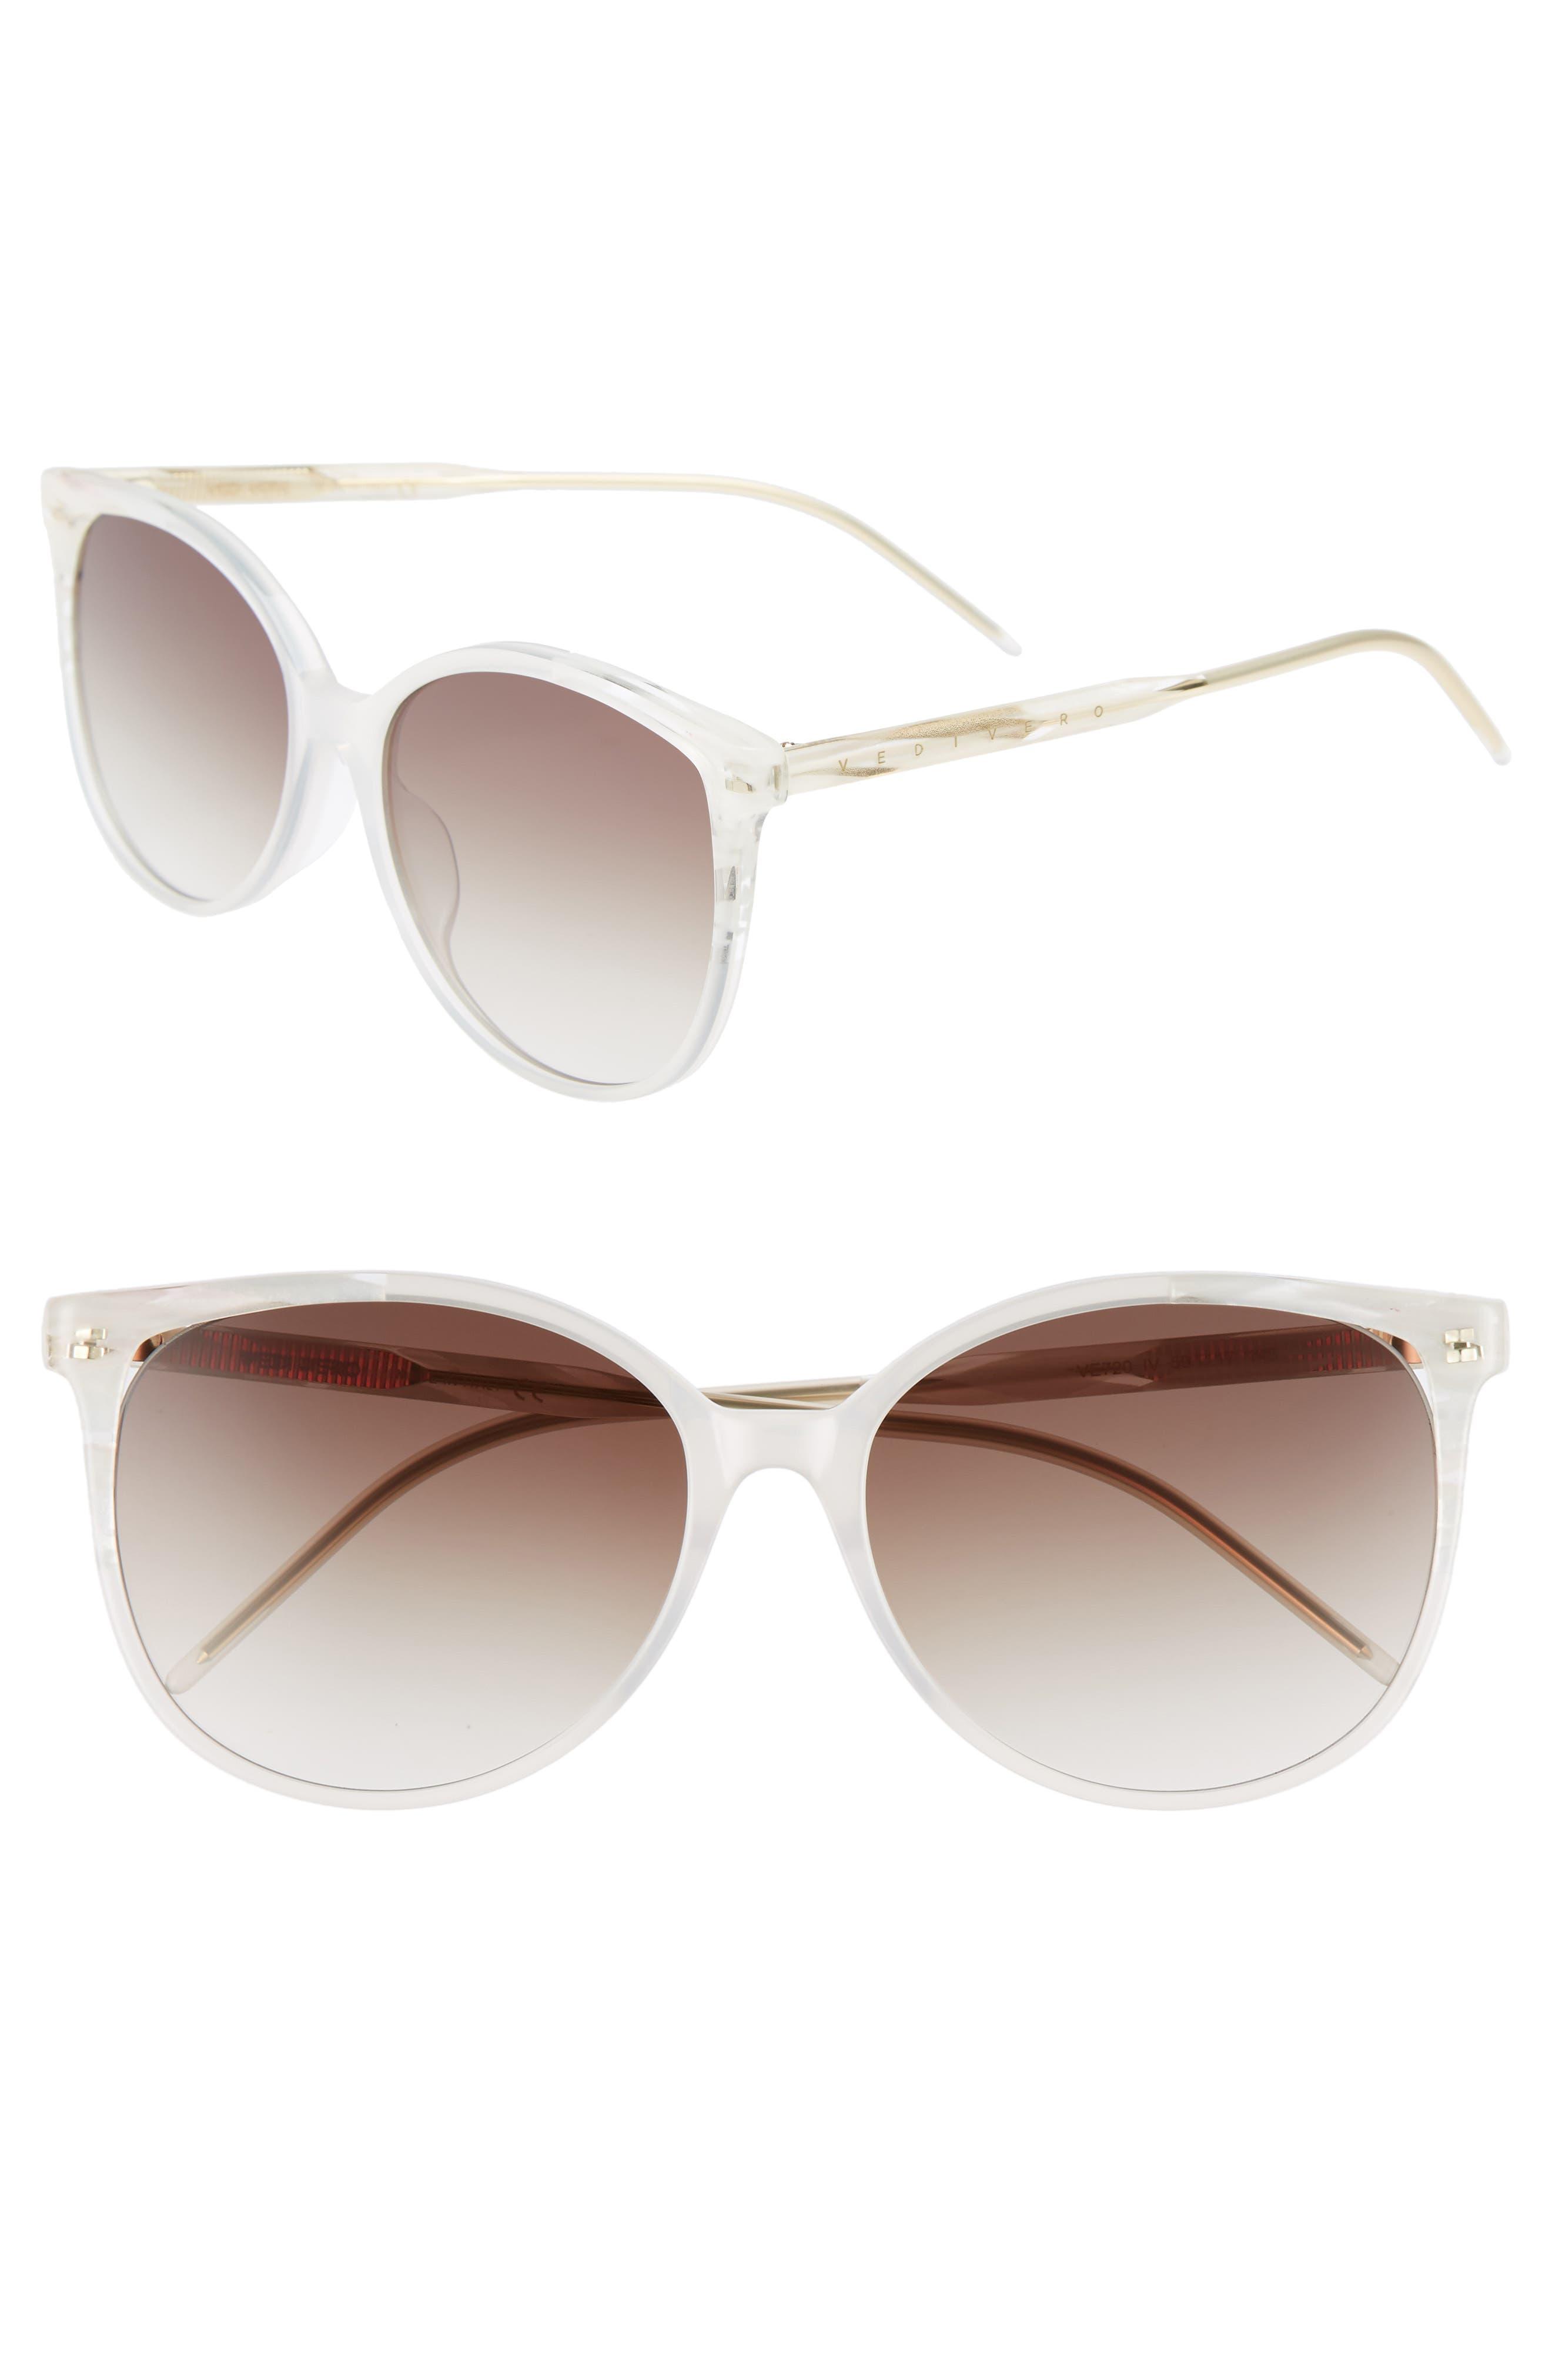 VEDI VERO 59mm Round Sunglasses